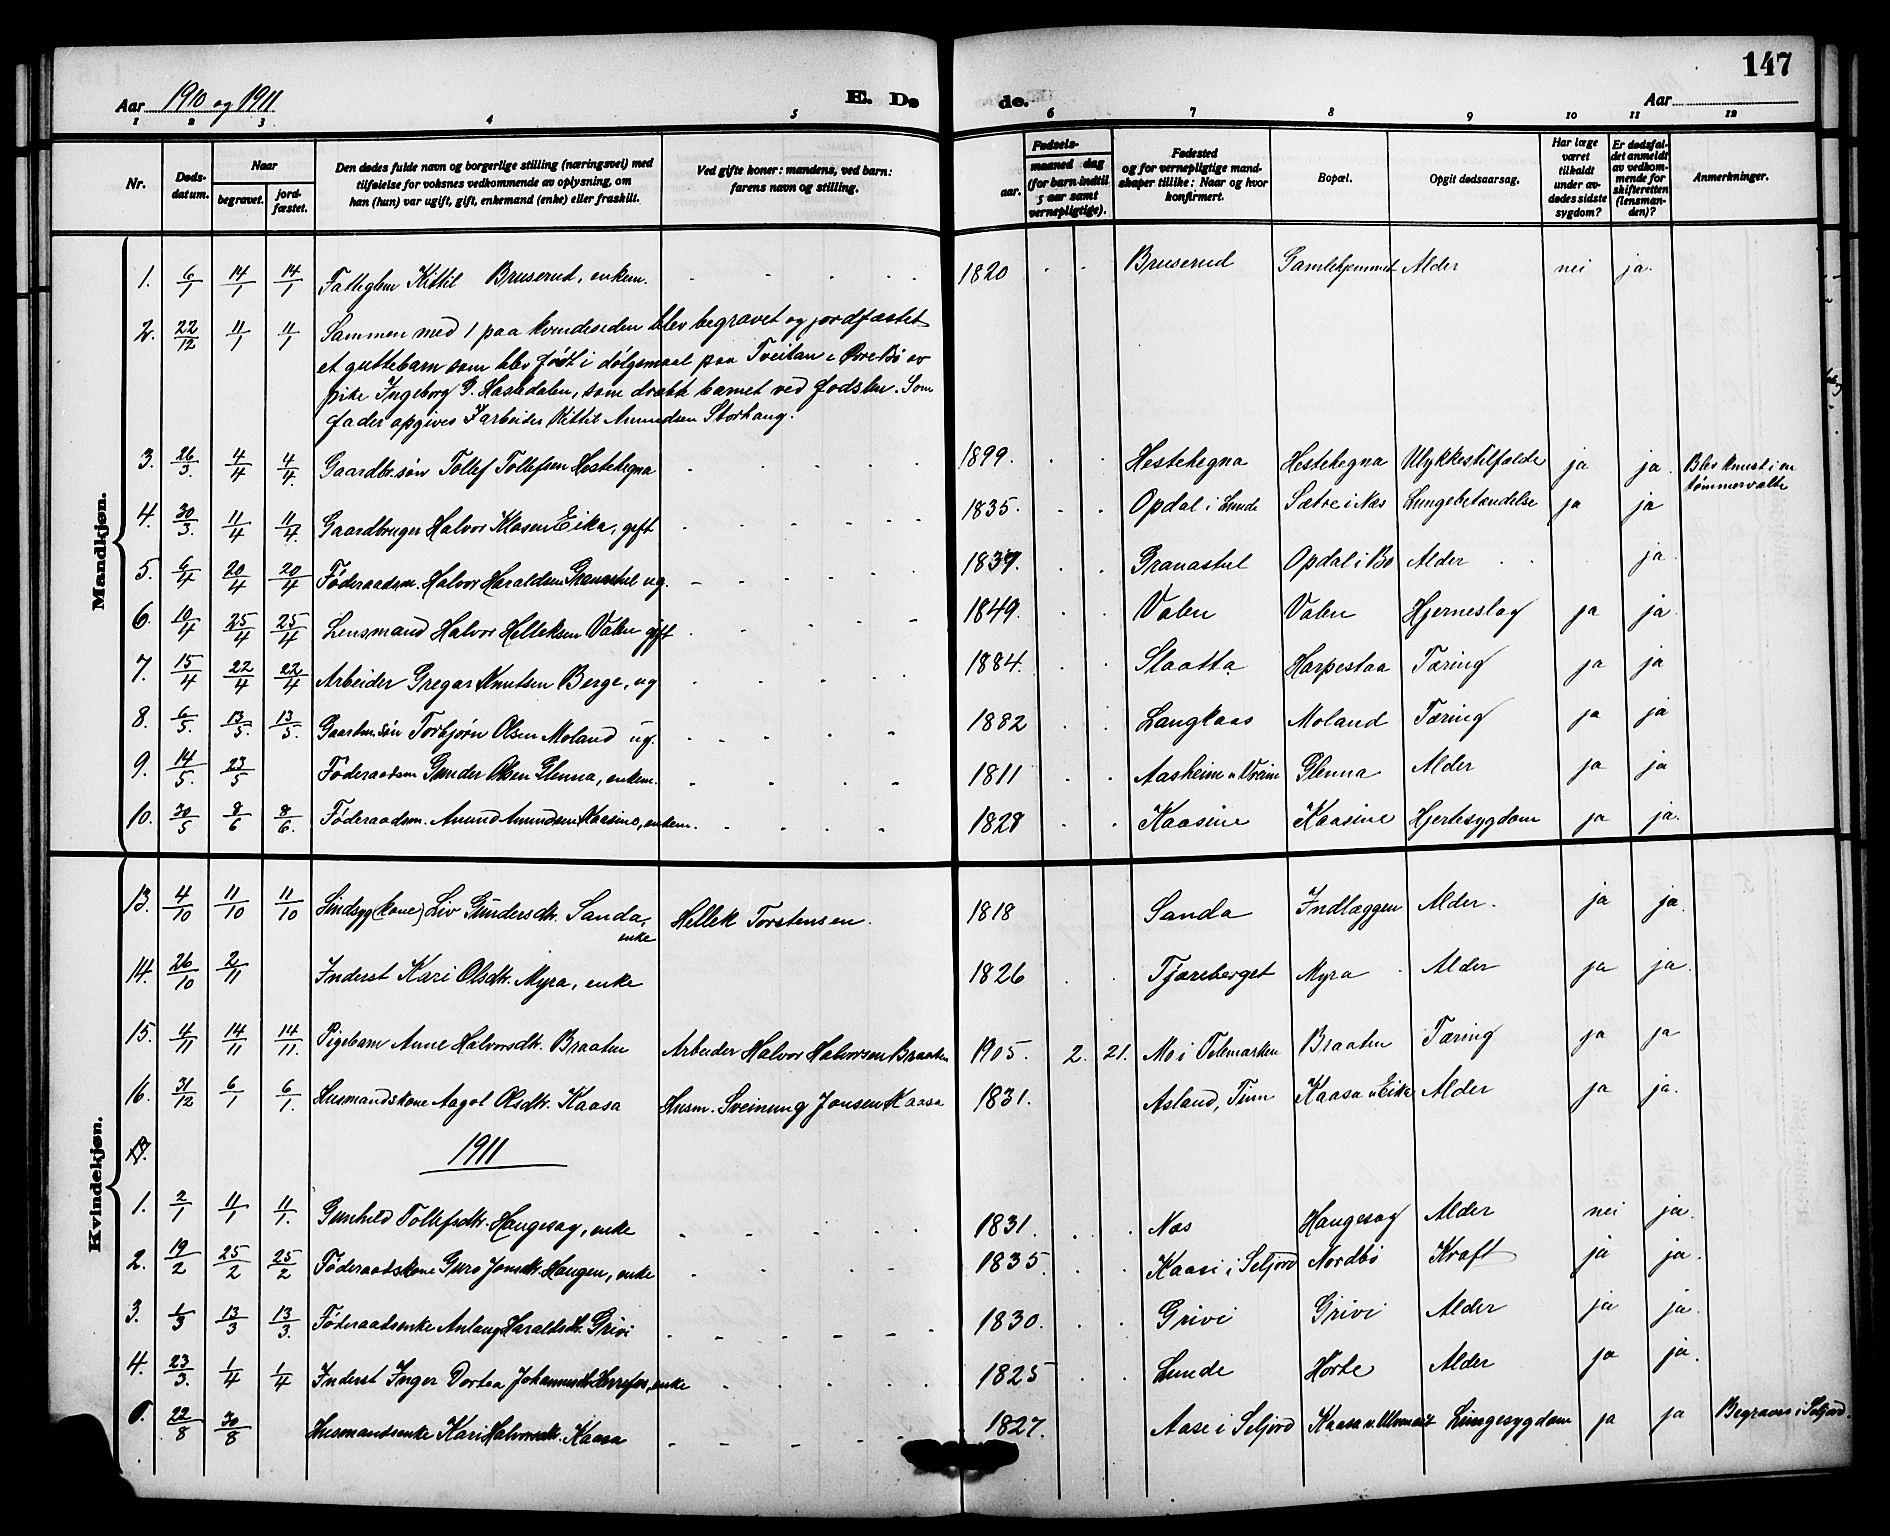 SAKO, Bø kirkebøker, G/Ga/L0007: Klokkerbok nr. 7, 1909-1924, s. 147